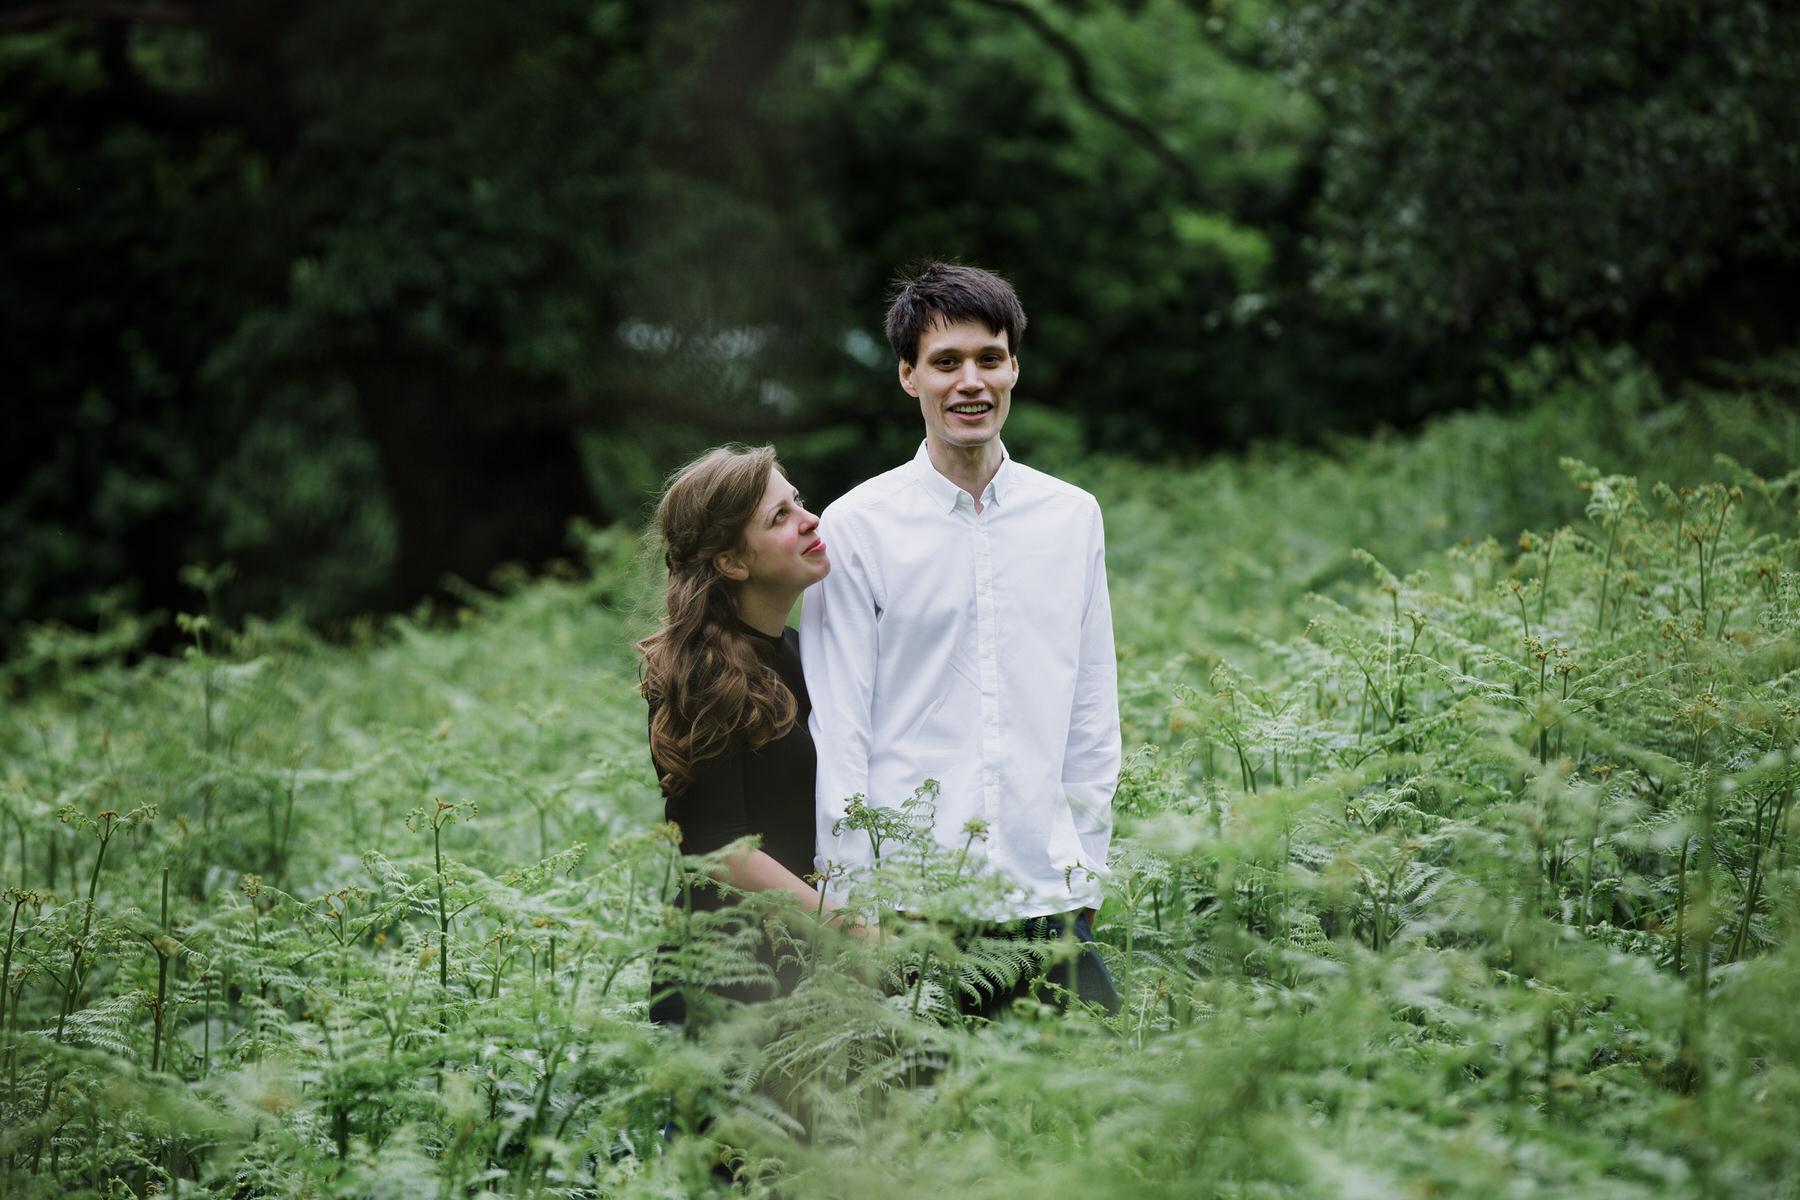 7-London natural couple portrait photographer giant fern_.jpg